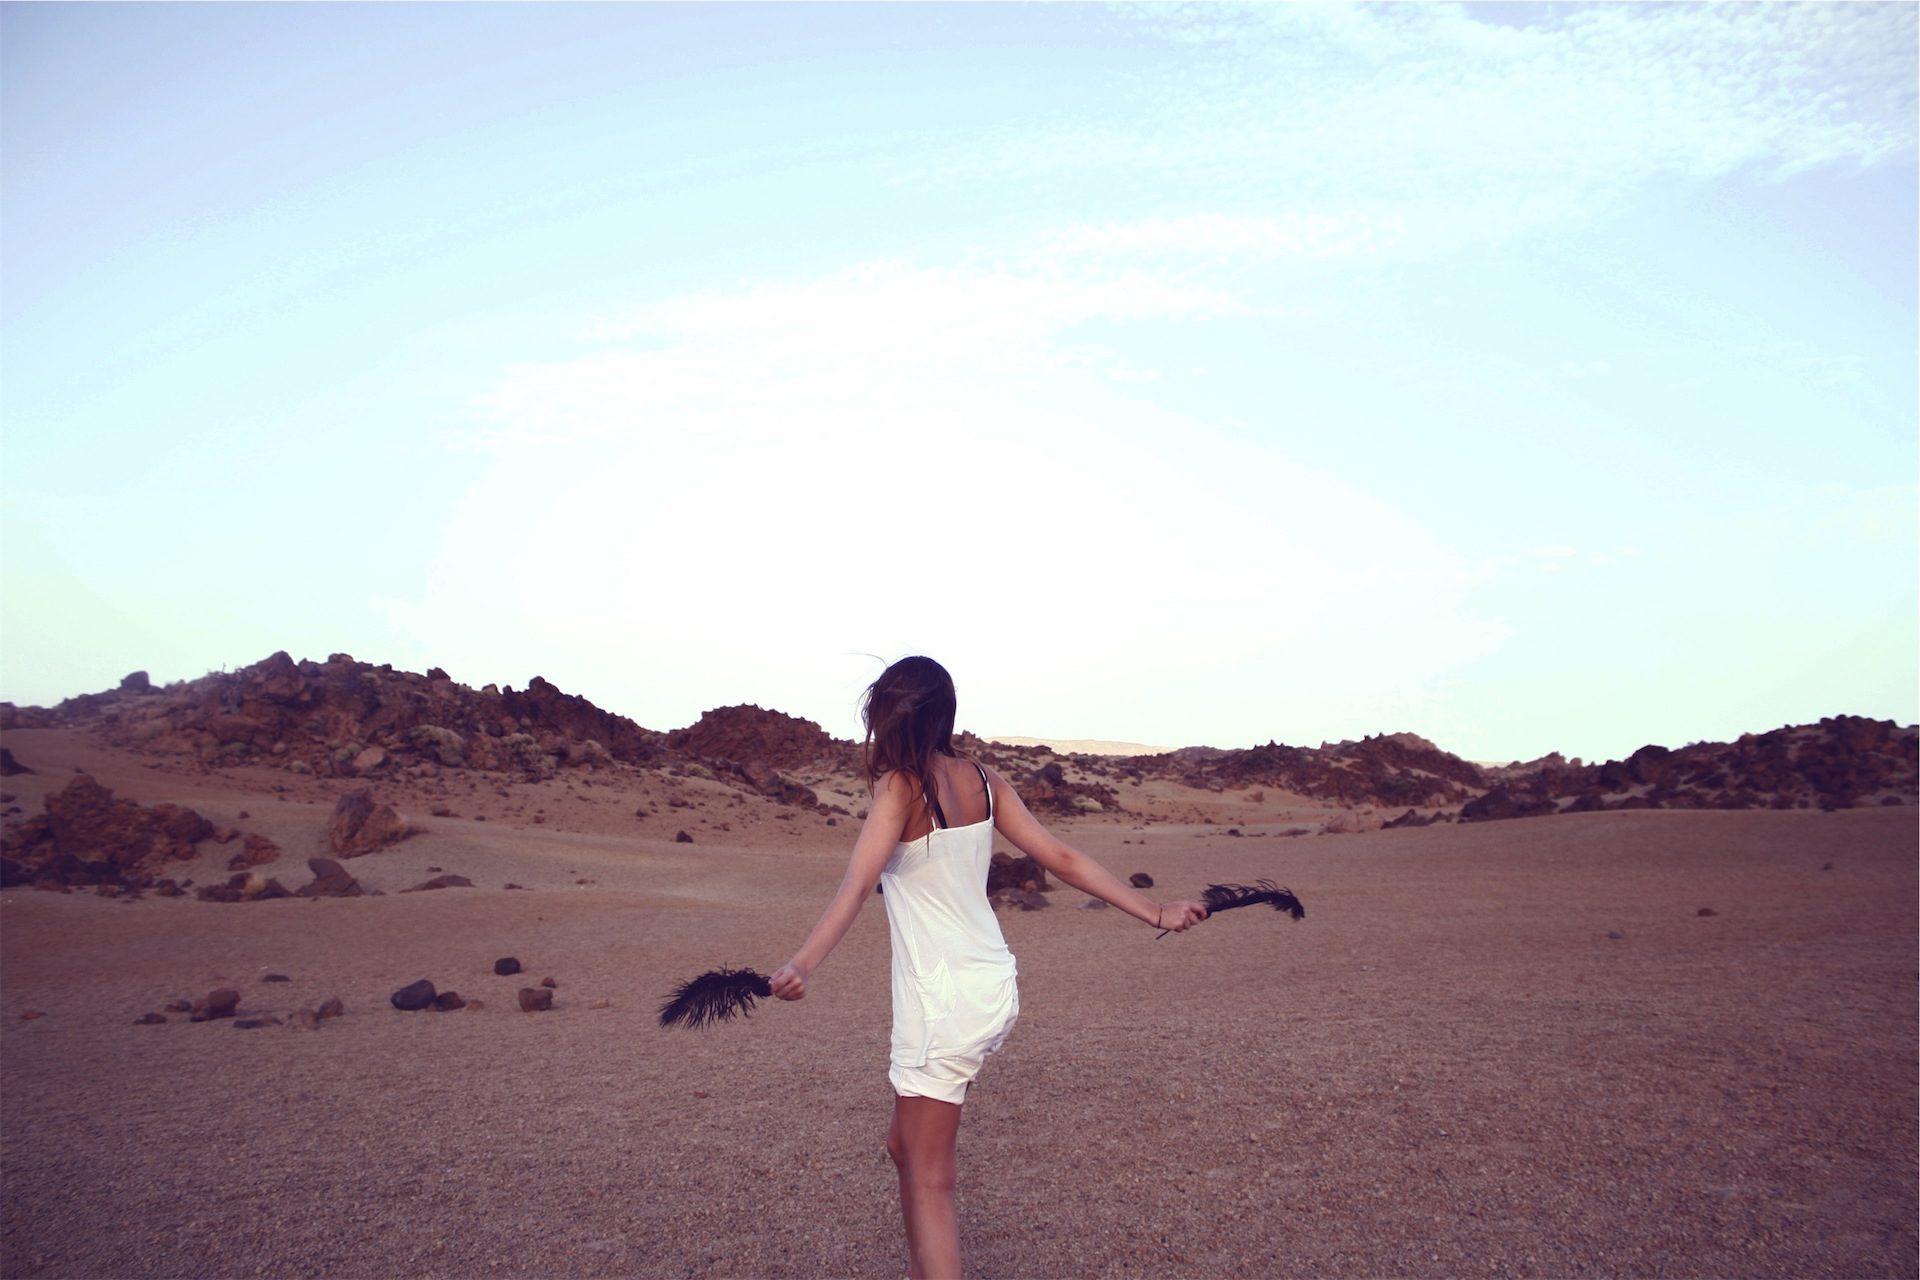 महिला, पोशाक, पंख, रेगिस्तान, आकाश, रेत - HD वॉलपेपर - प्रोफेसर-falken.com